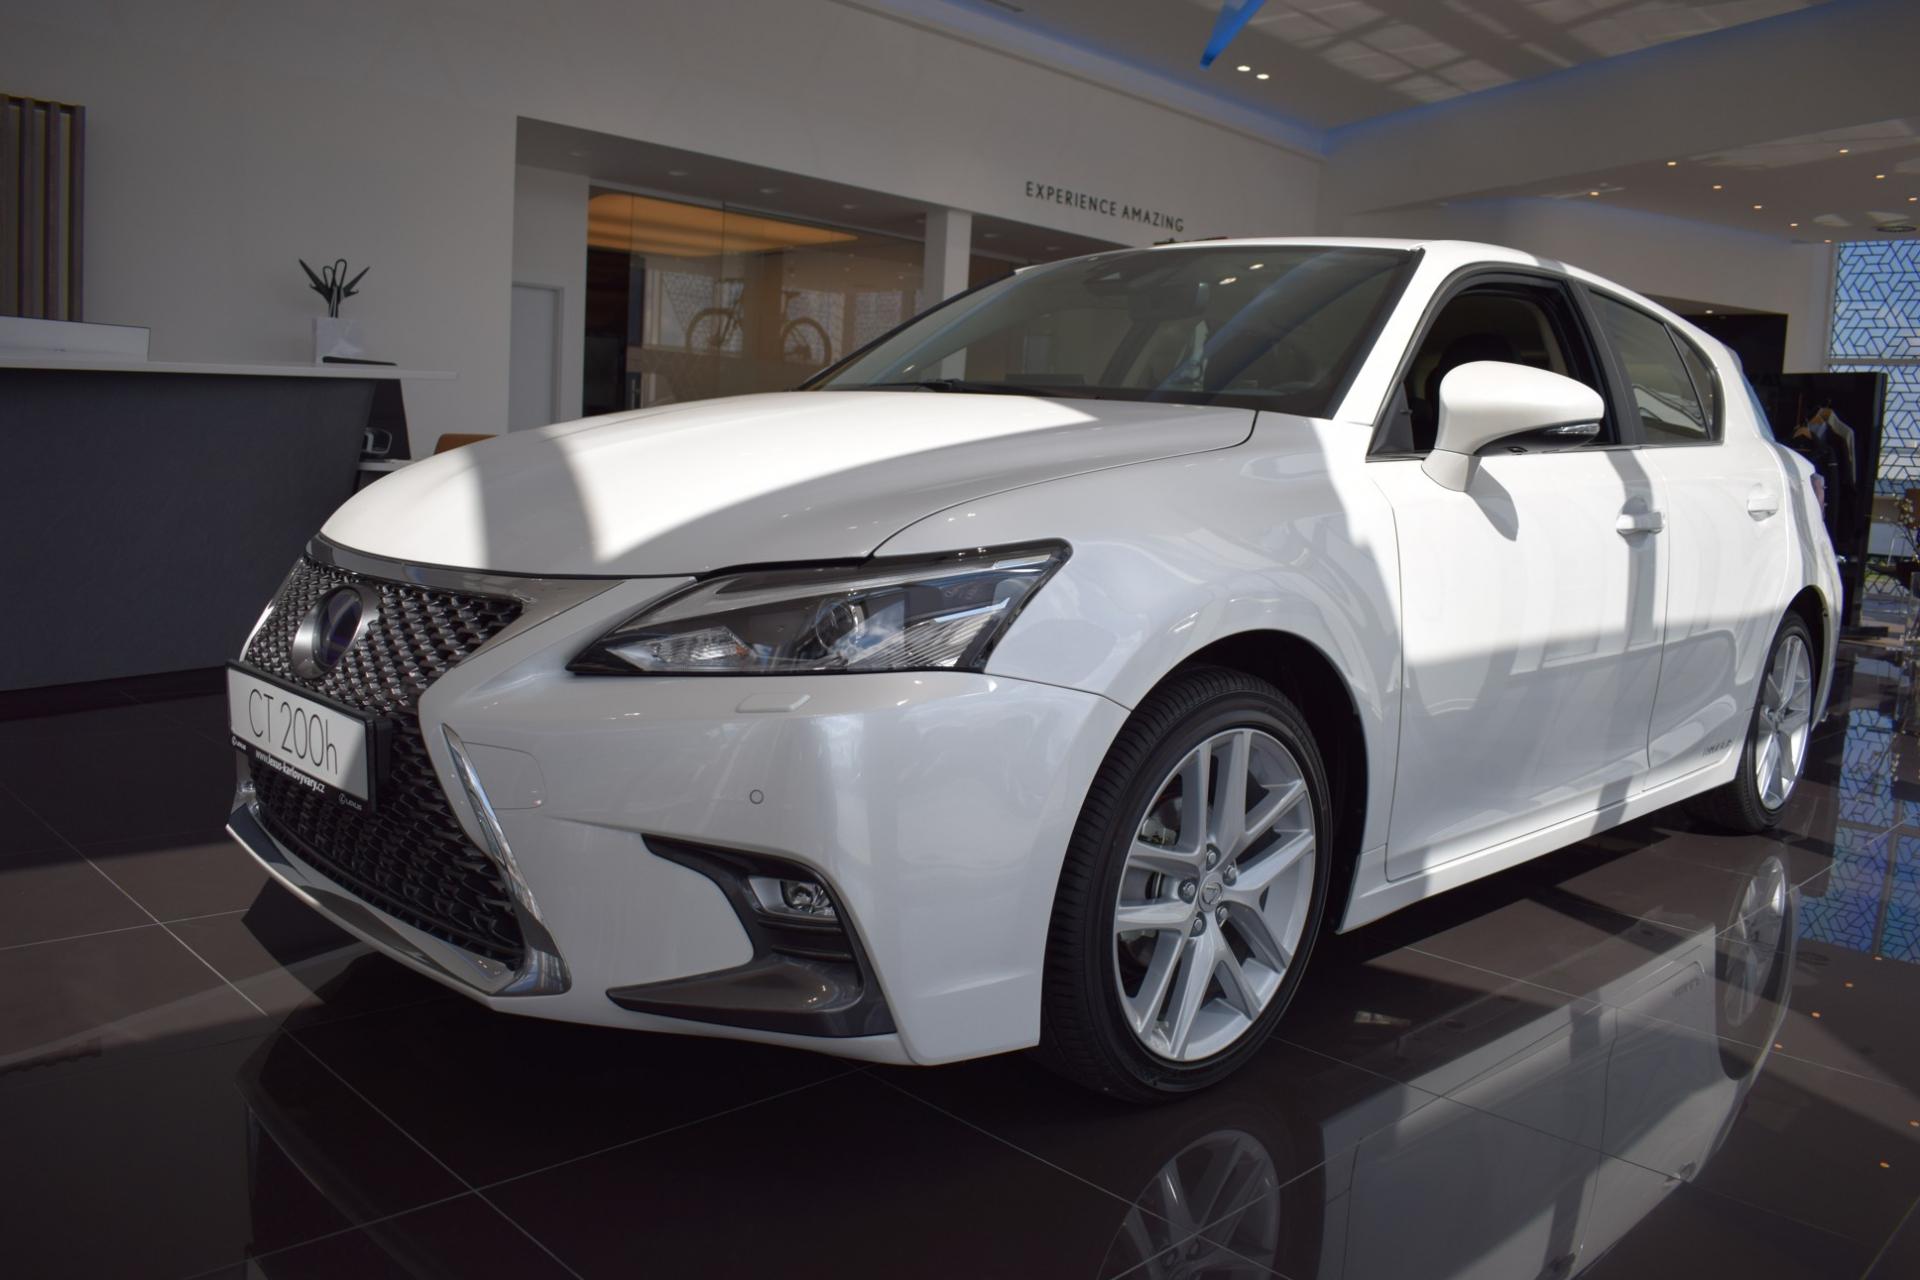 Lexus CT LIMITED EDITION Safety 1.8L Petrol Hybrid (136 k) aut. e-CVT